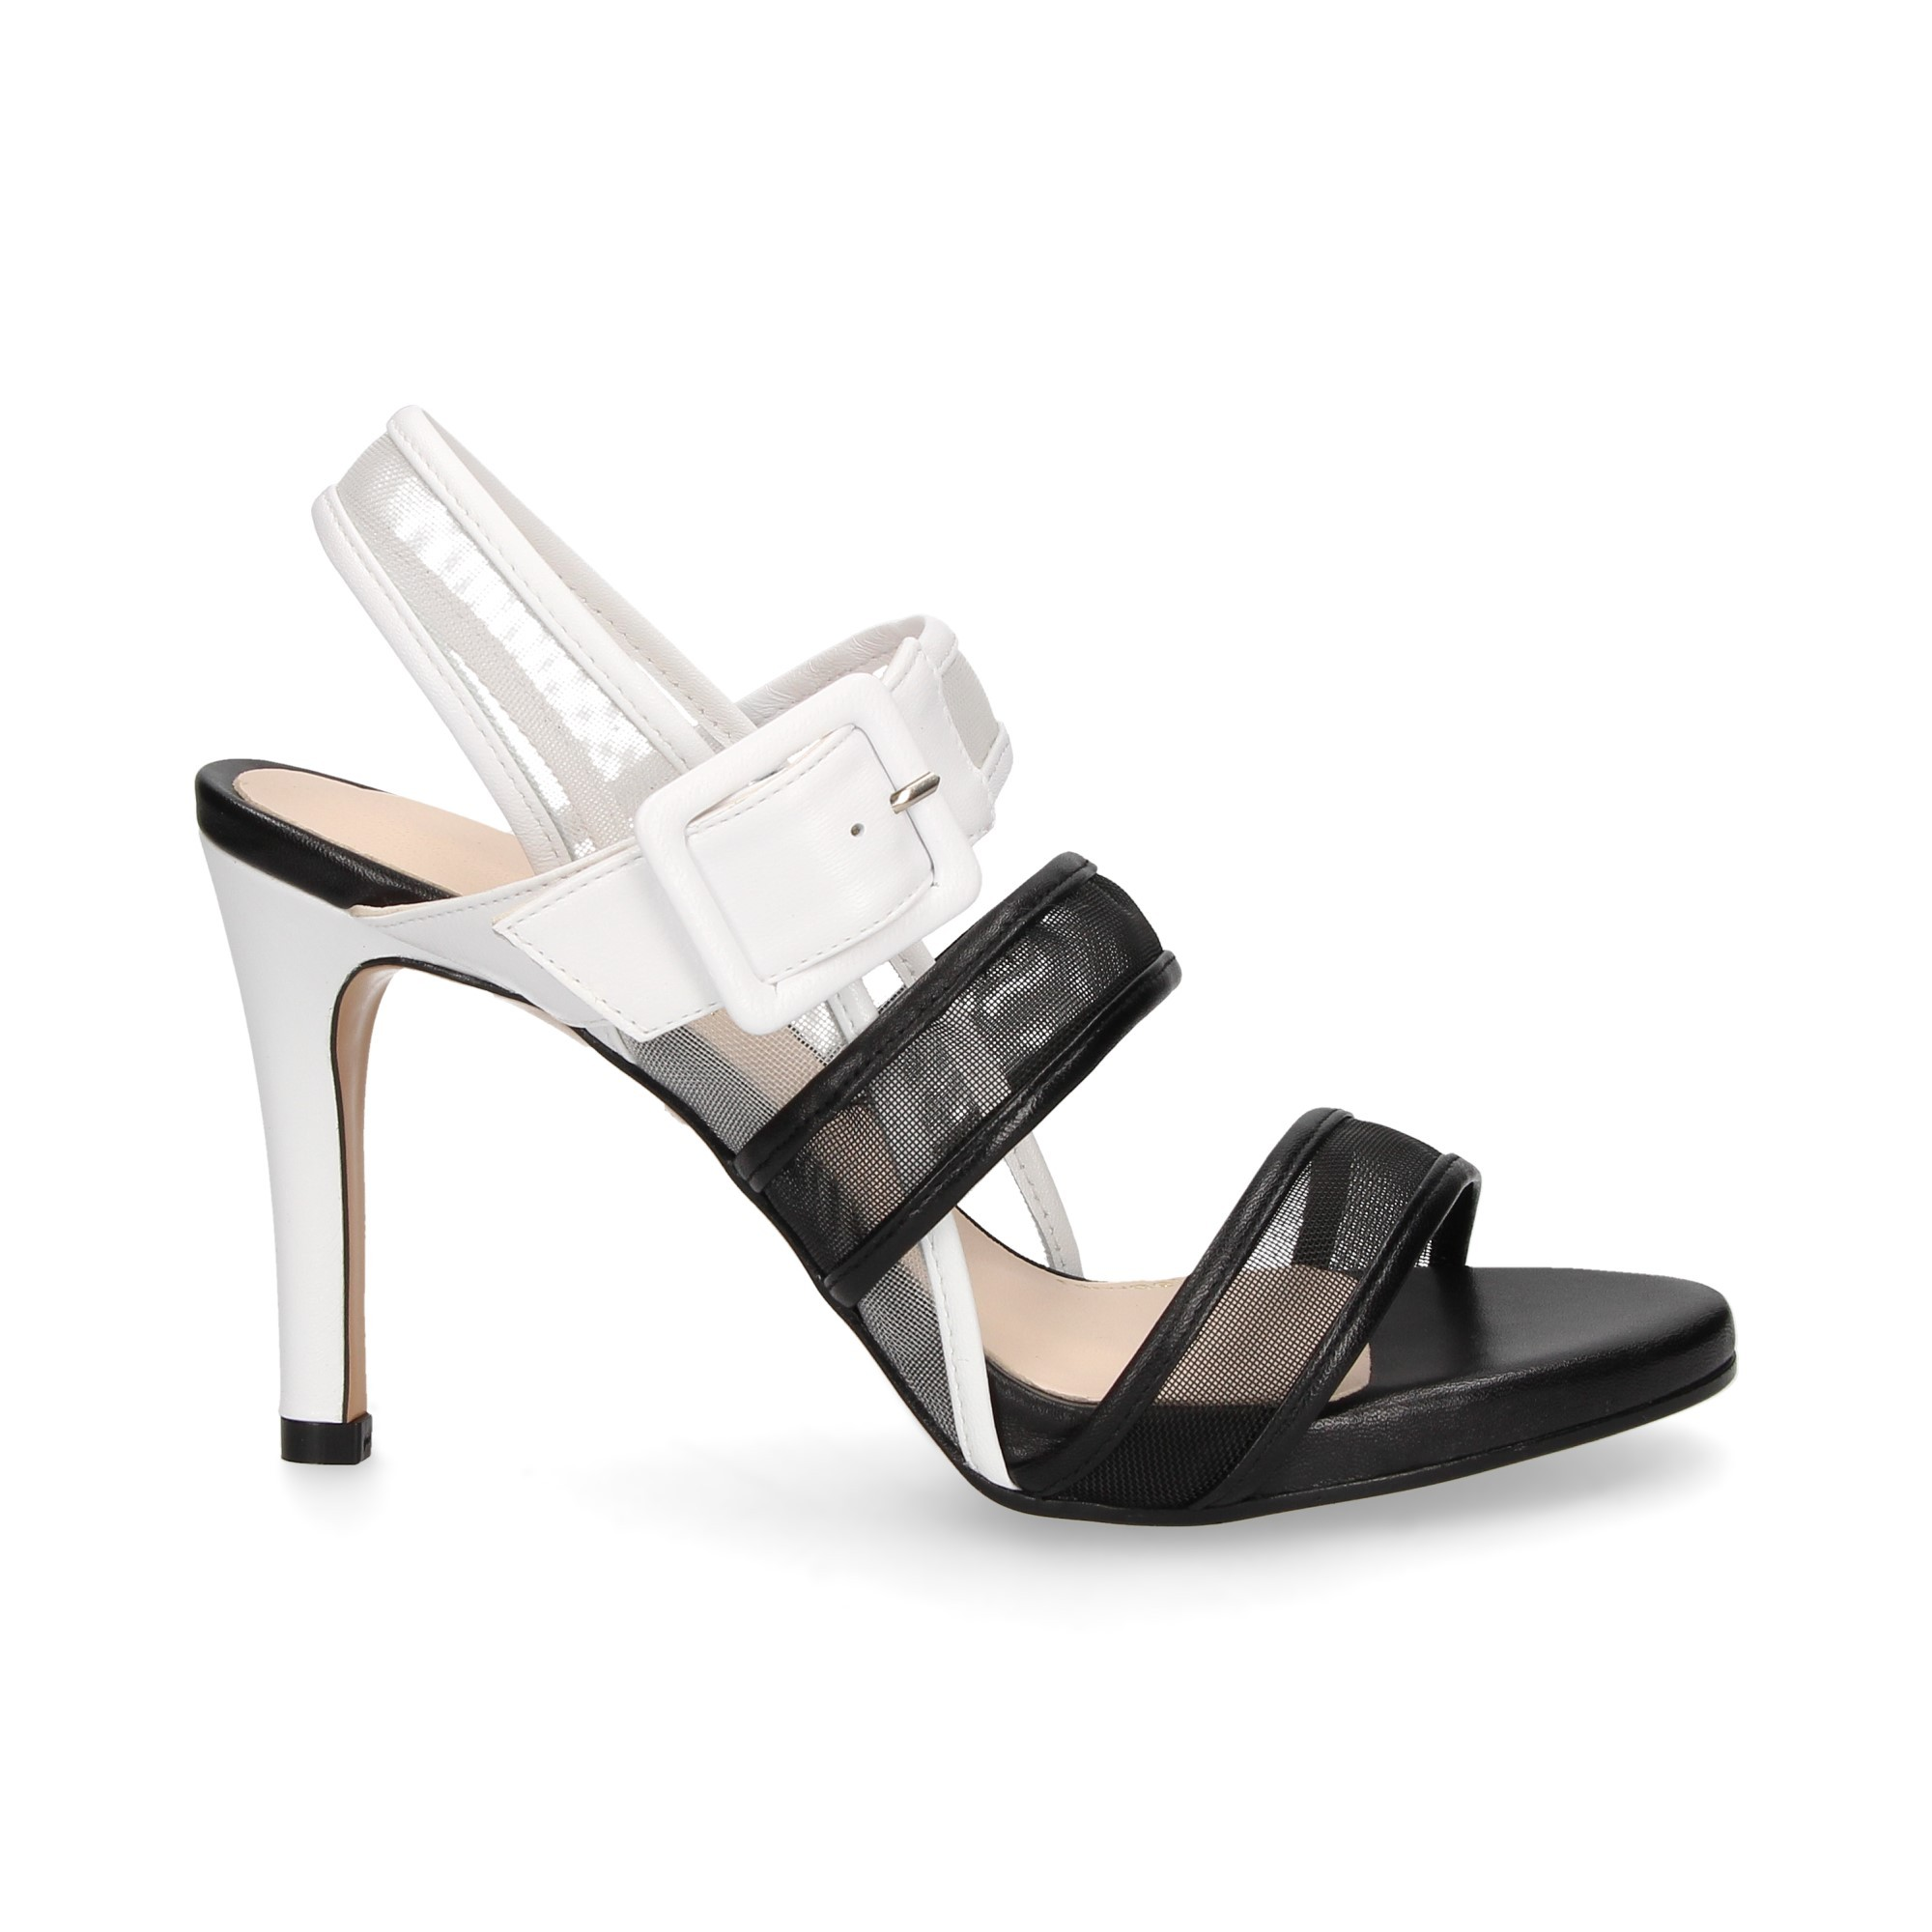 sandalia-3-tiras-rejilla-piel-bl-negro